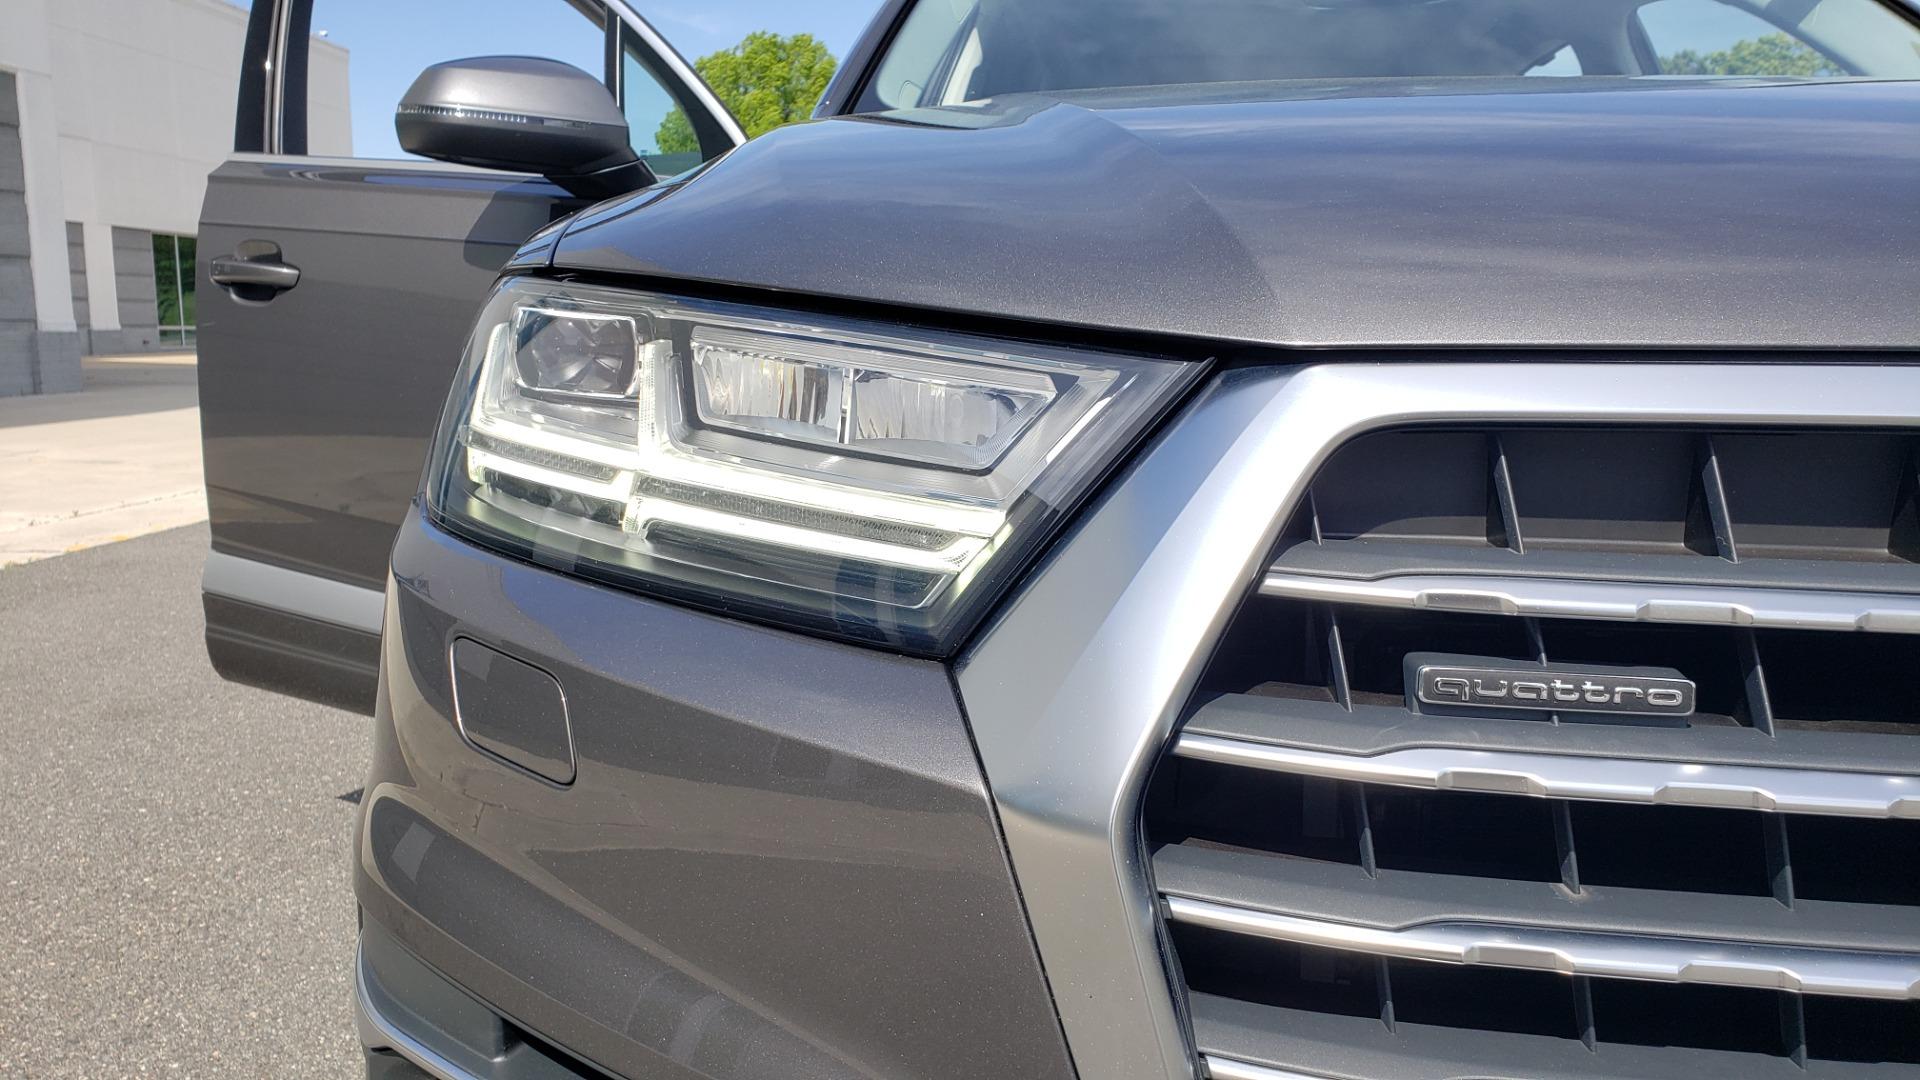 Used 2018 Audi Q7 PRESTIGE TIPTRONIC / NAV / SUNROOF / ADAPTIVE PKG / DRVR ASST / CLD WTHR /  for sale $49,995 at Formula Imports in Charlotte NC 28227 21